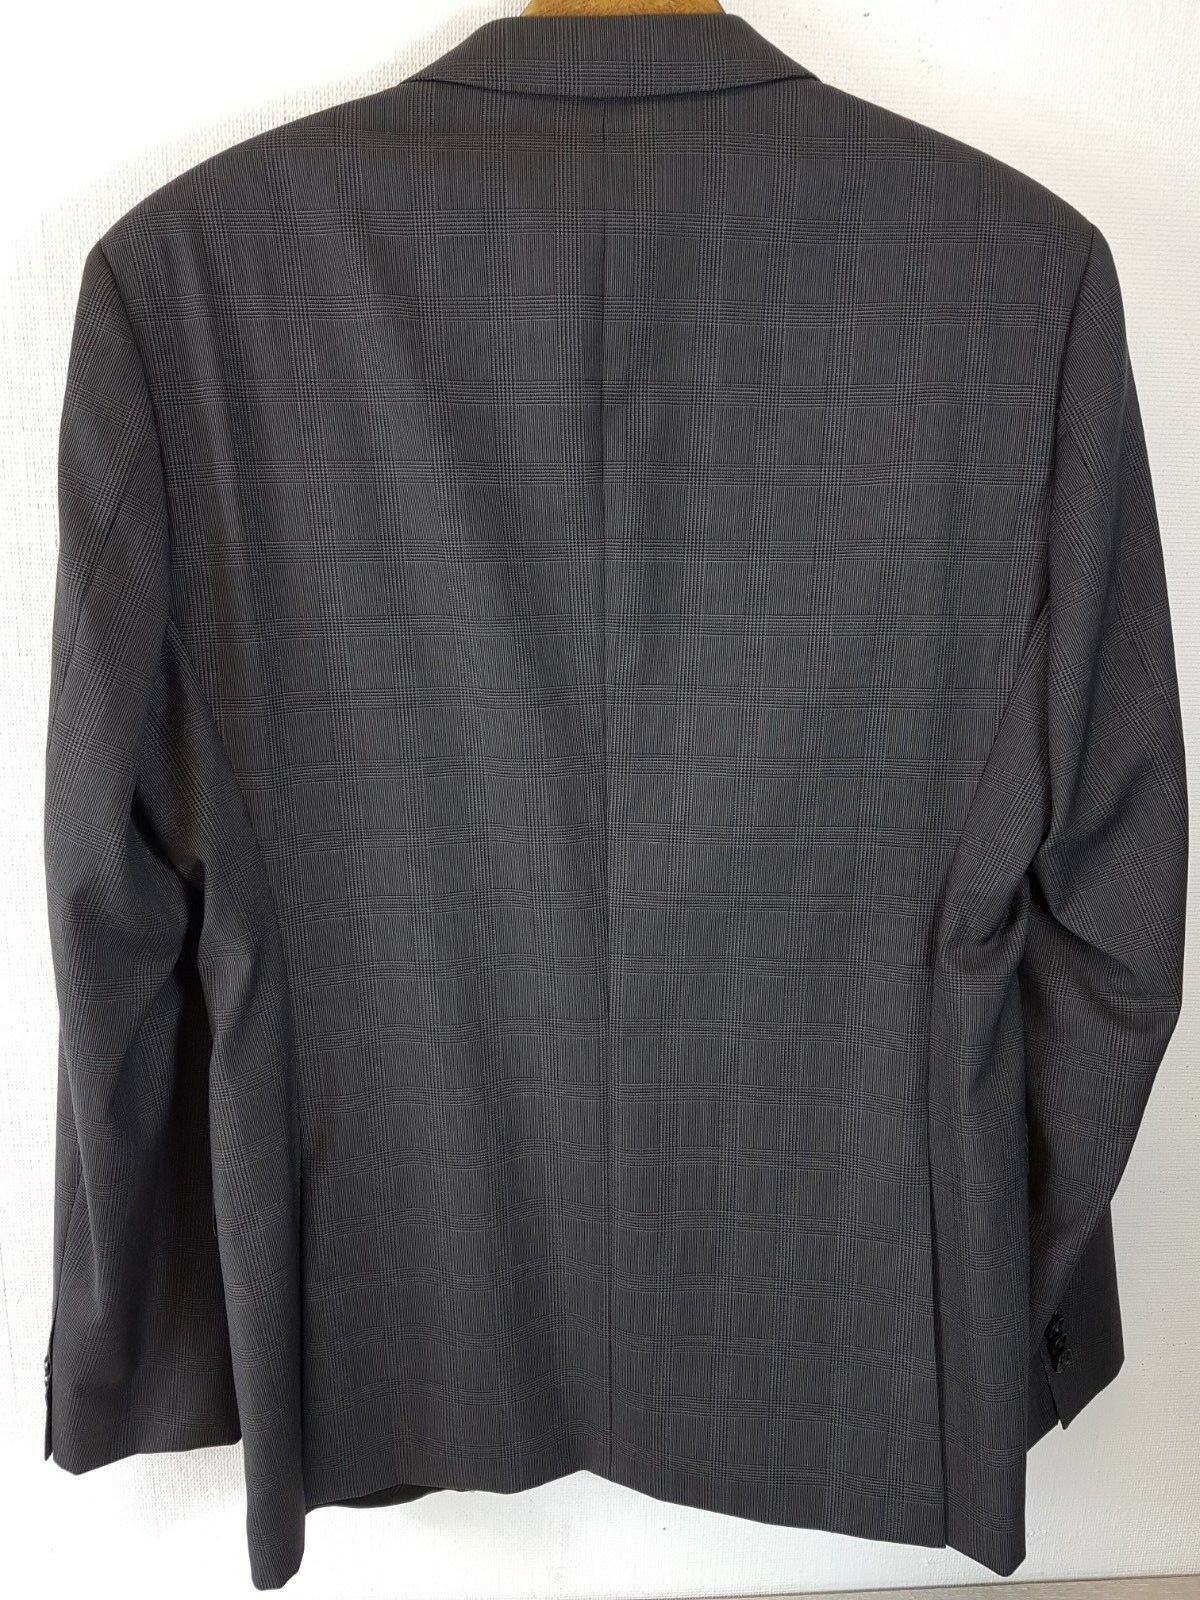 7d6608c92 Hugo Boss Genuine James Sharp Mens Suit Charcoal Top Jacket Size 40 ...